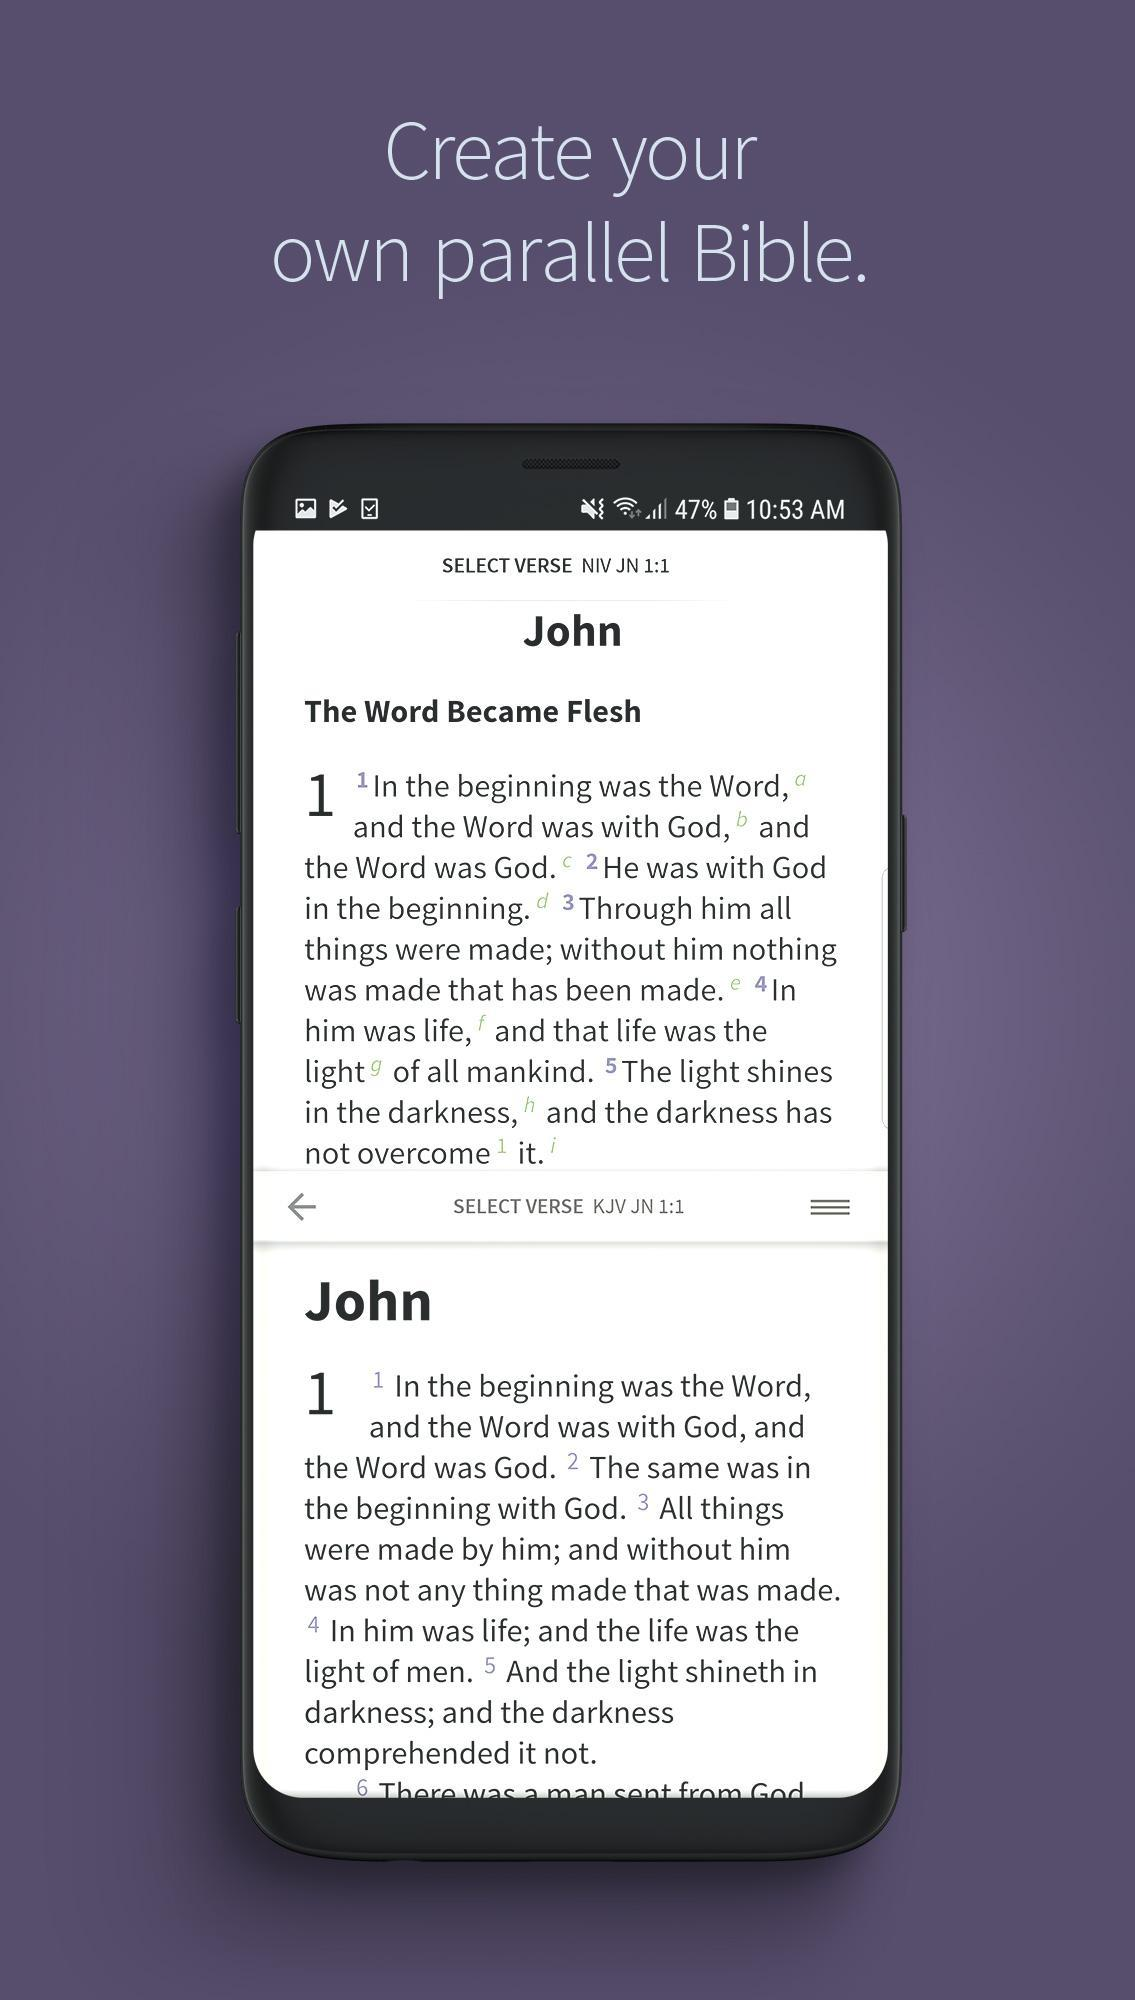 Bible App by Olive Tree 7.5.4.0.5664 Screenshot 6